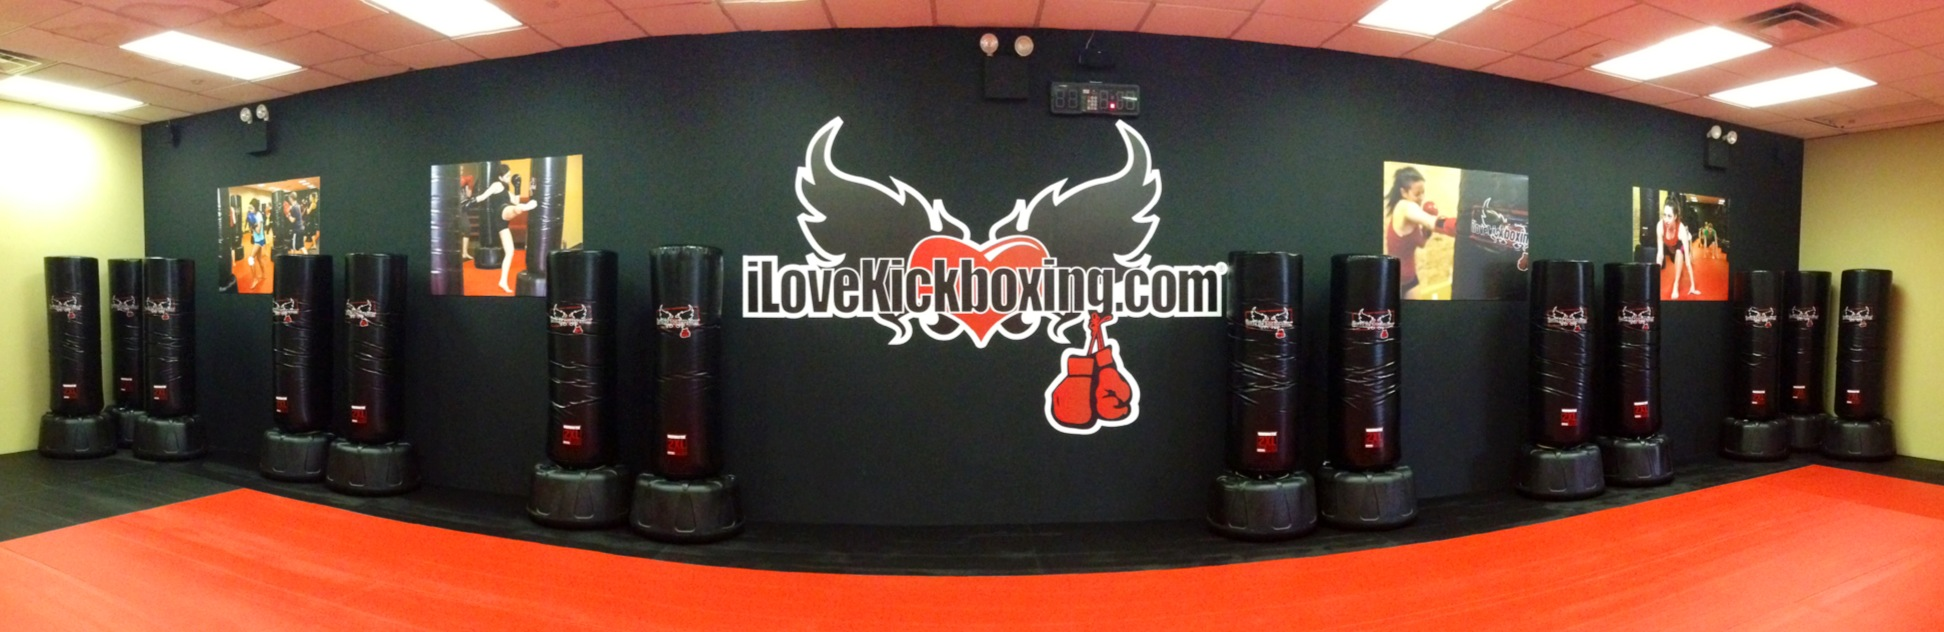 I Love Kickboxing - Bayside